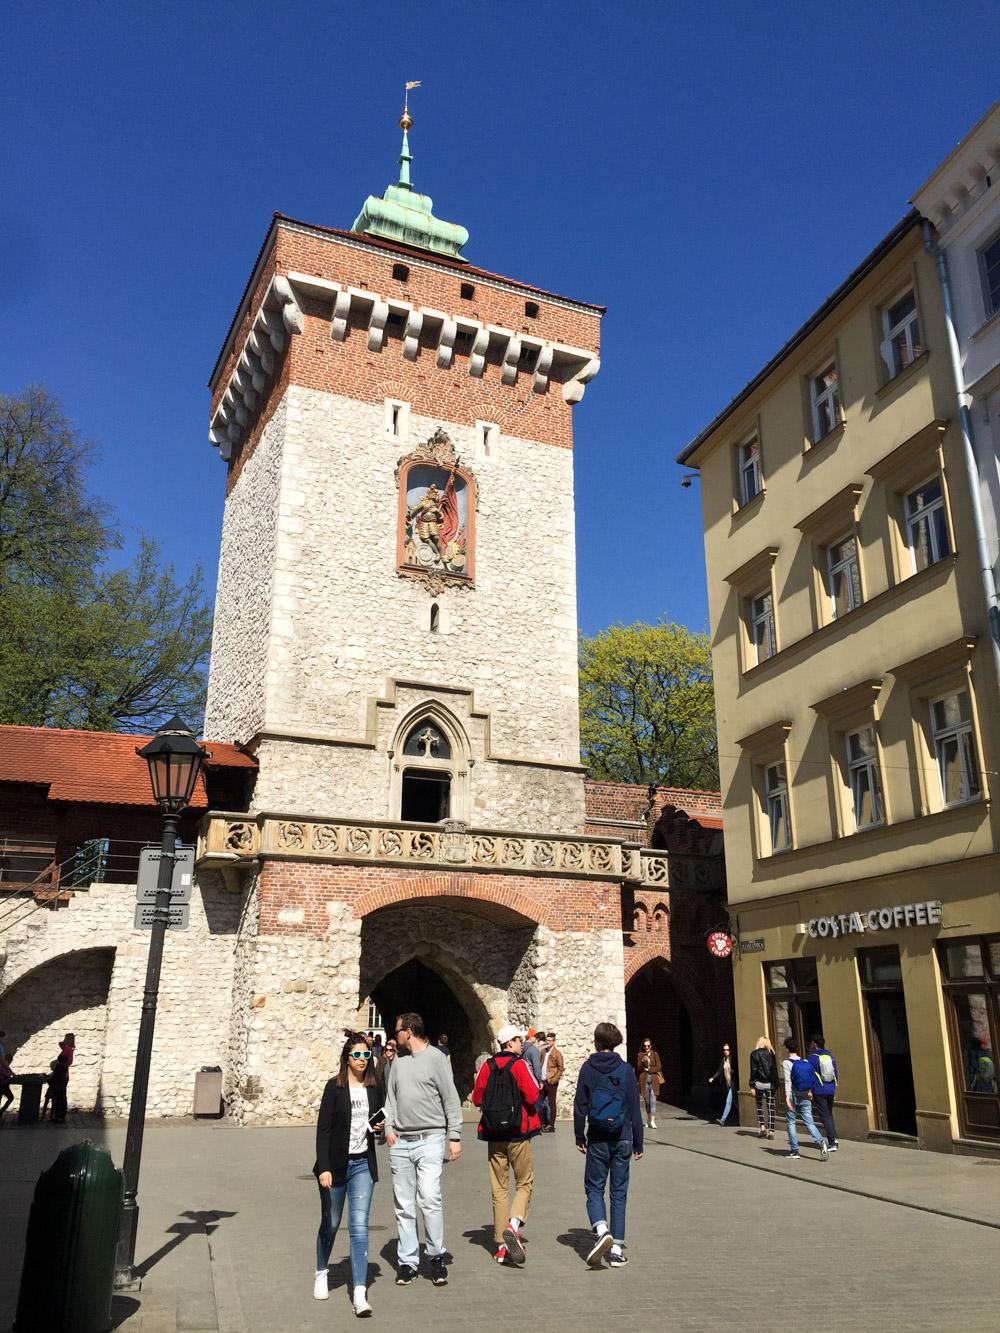 St. Florian's Gate